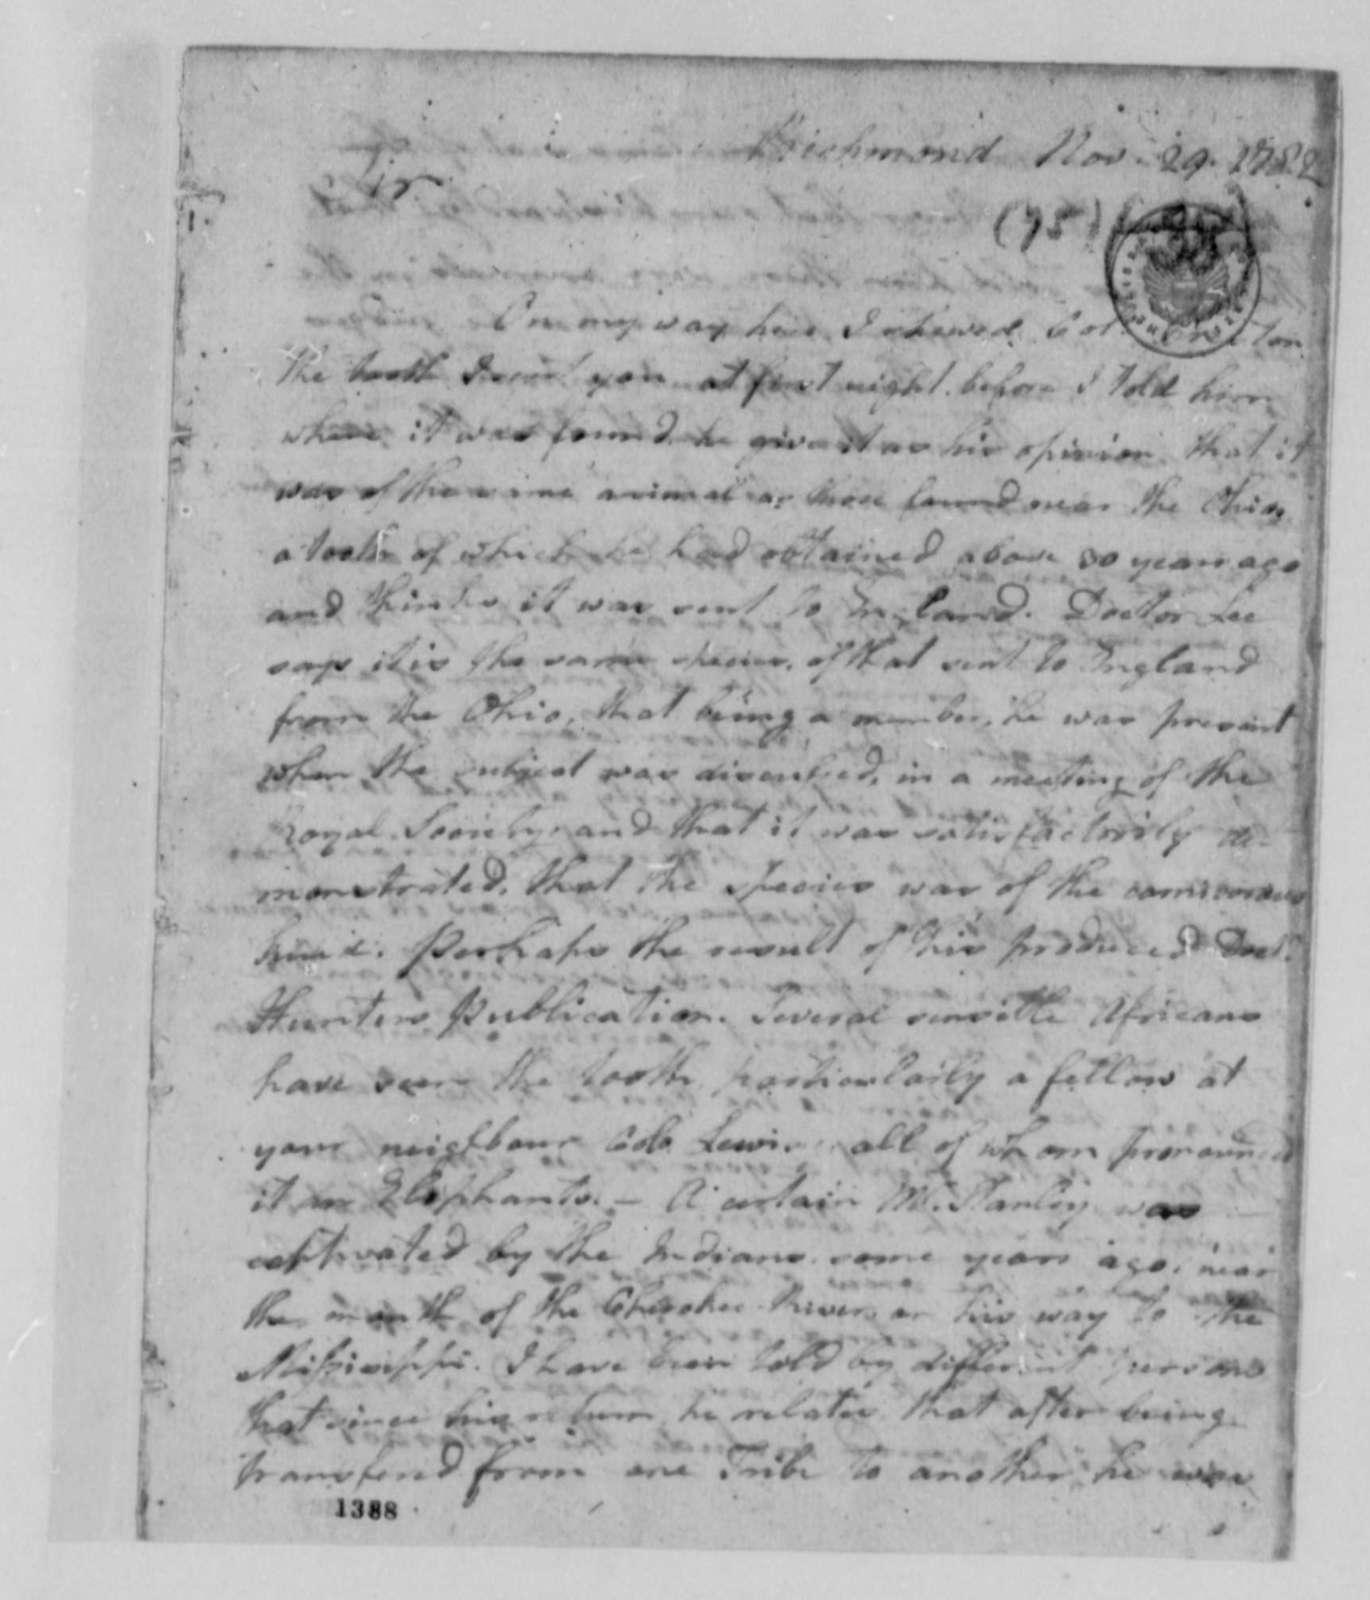 Arthur Campbell to Thomas Jefferson, November 29, 1782